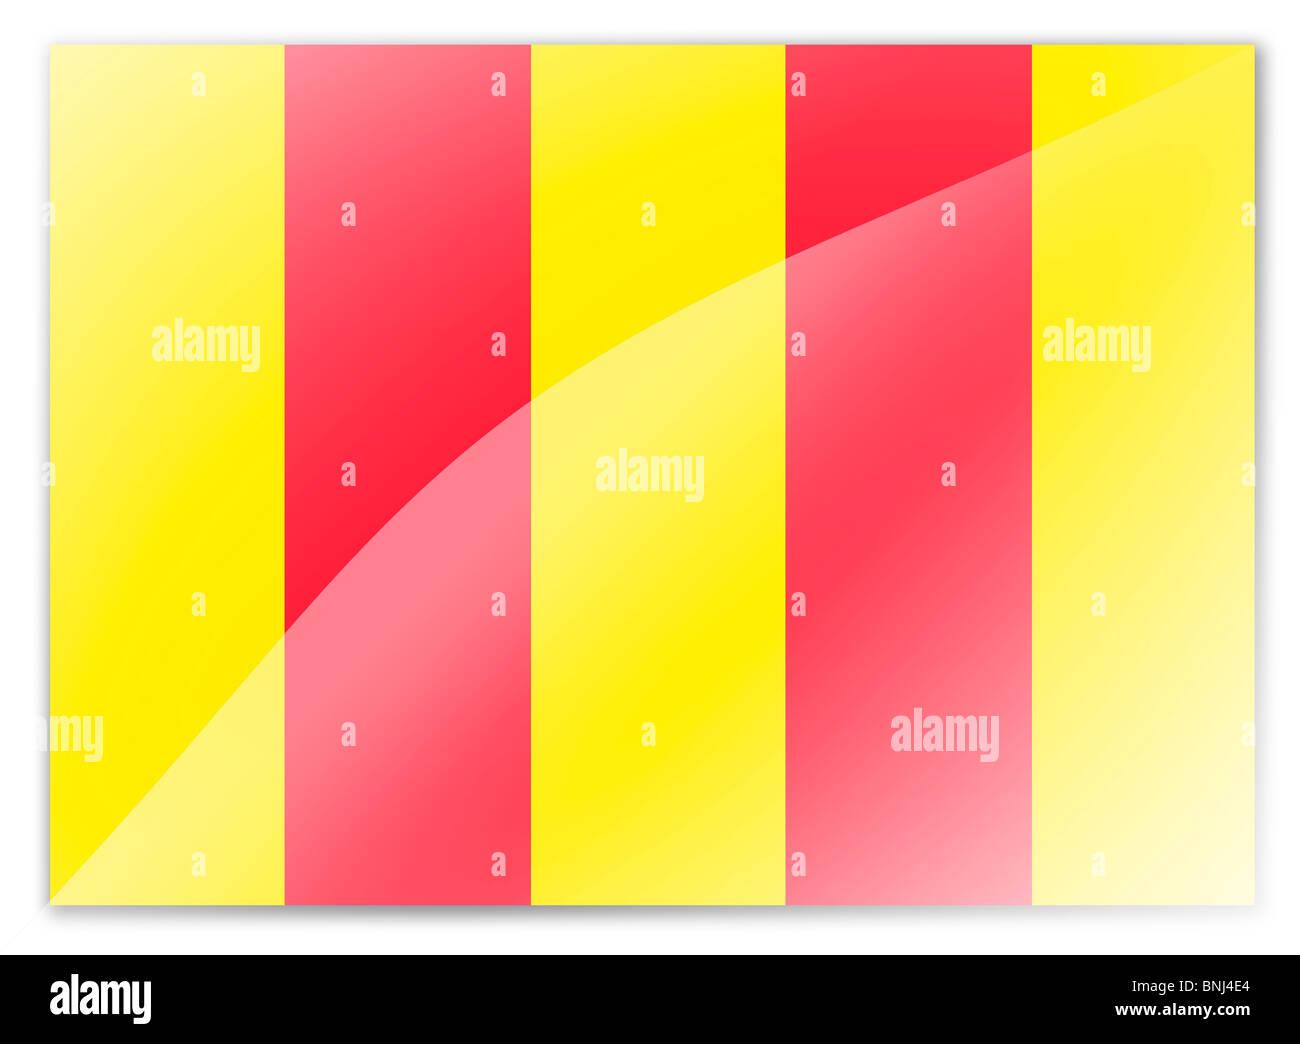 El MarsuMuseo - Graphics by MARSUPILAMI - Página 87 Slippery-track-flag-f1-grand-prix-BNJ4E4